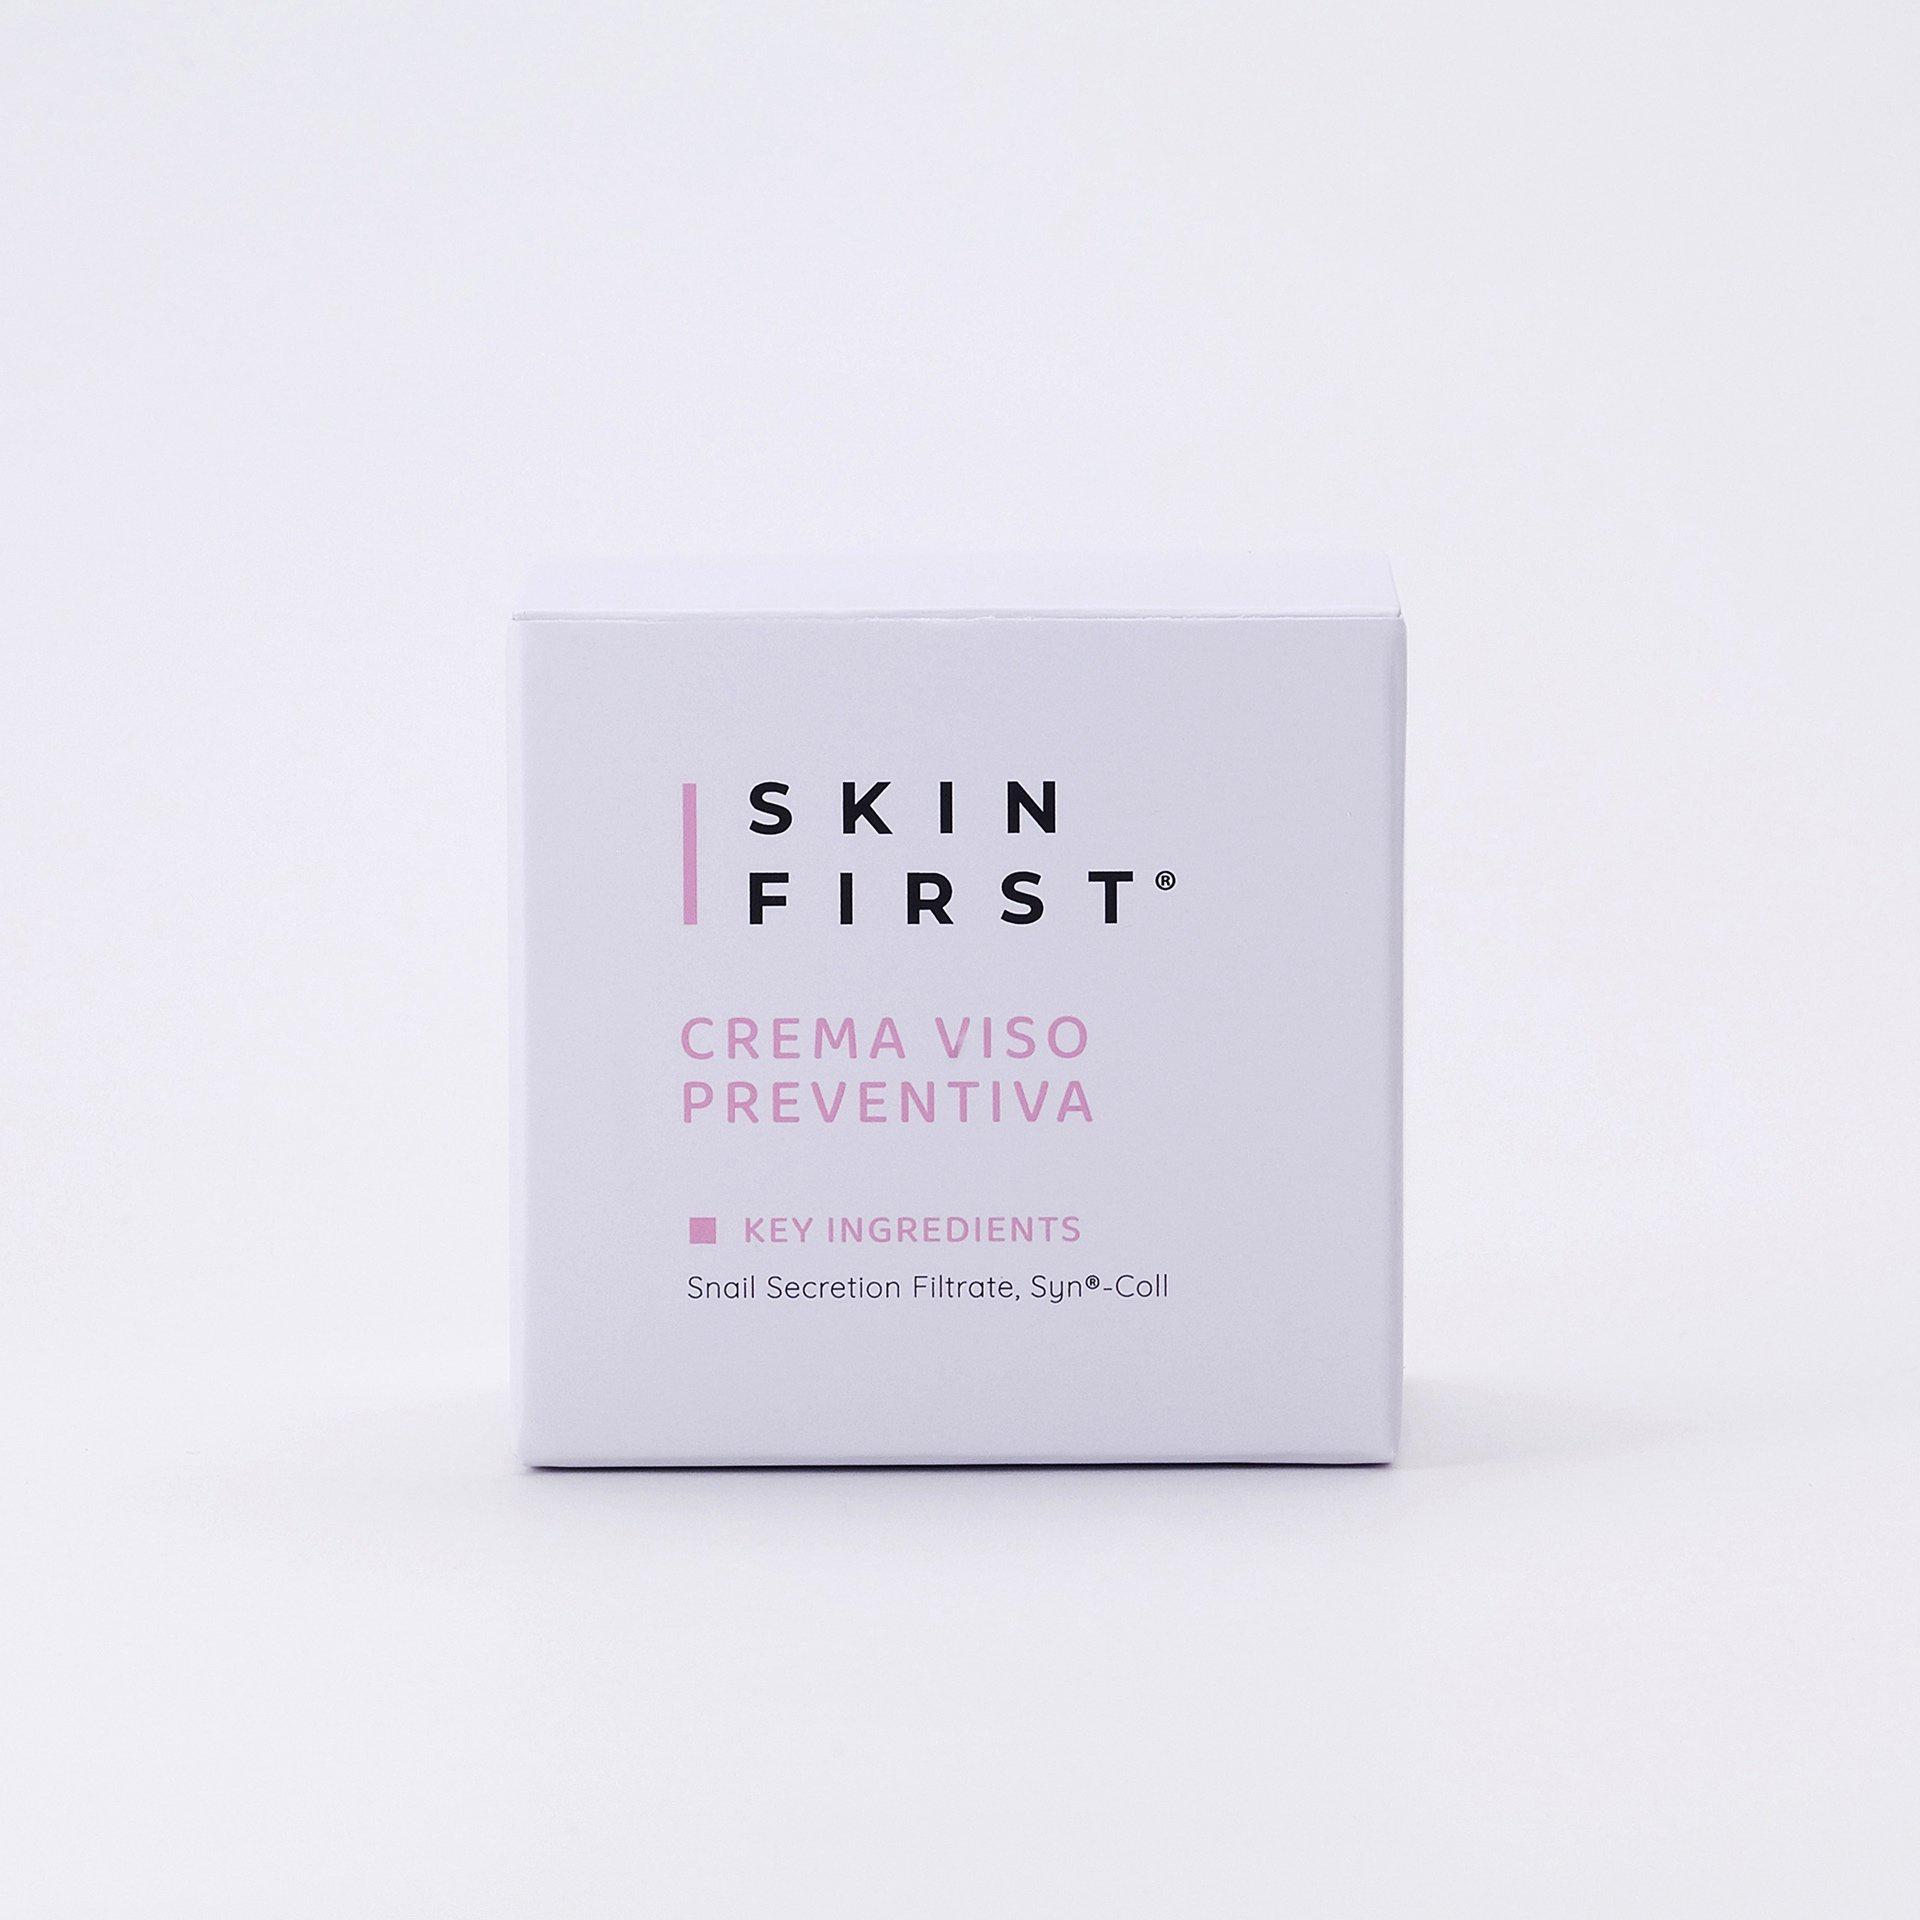 Skin first Crema Viso Preventiva